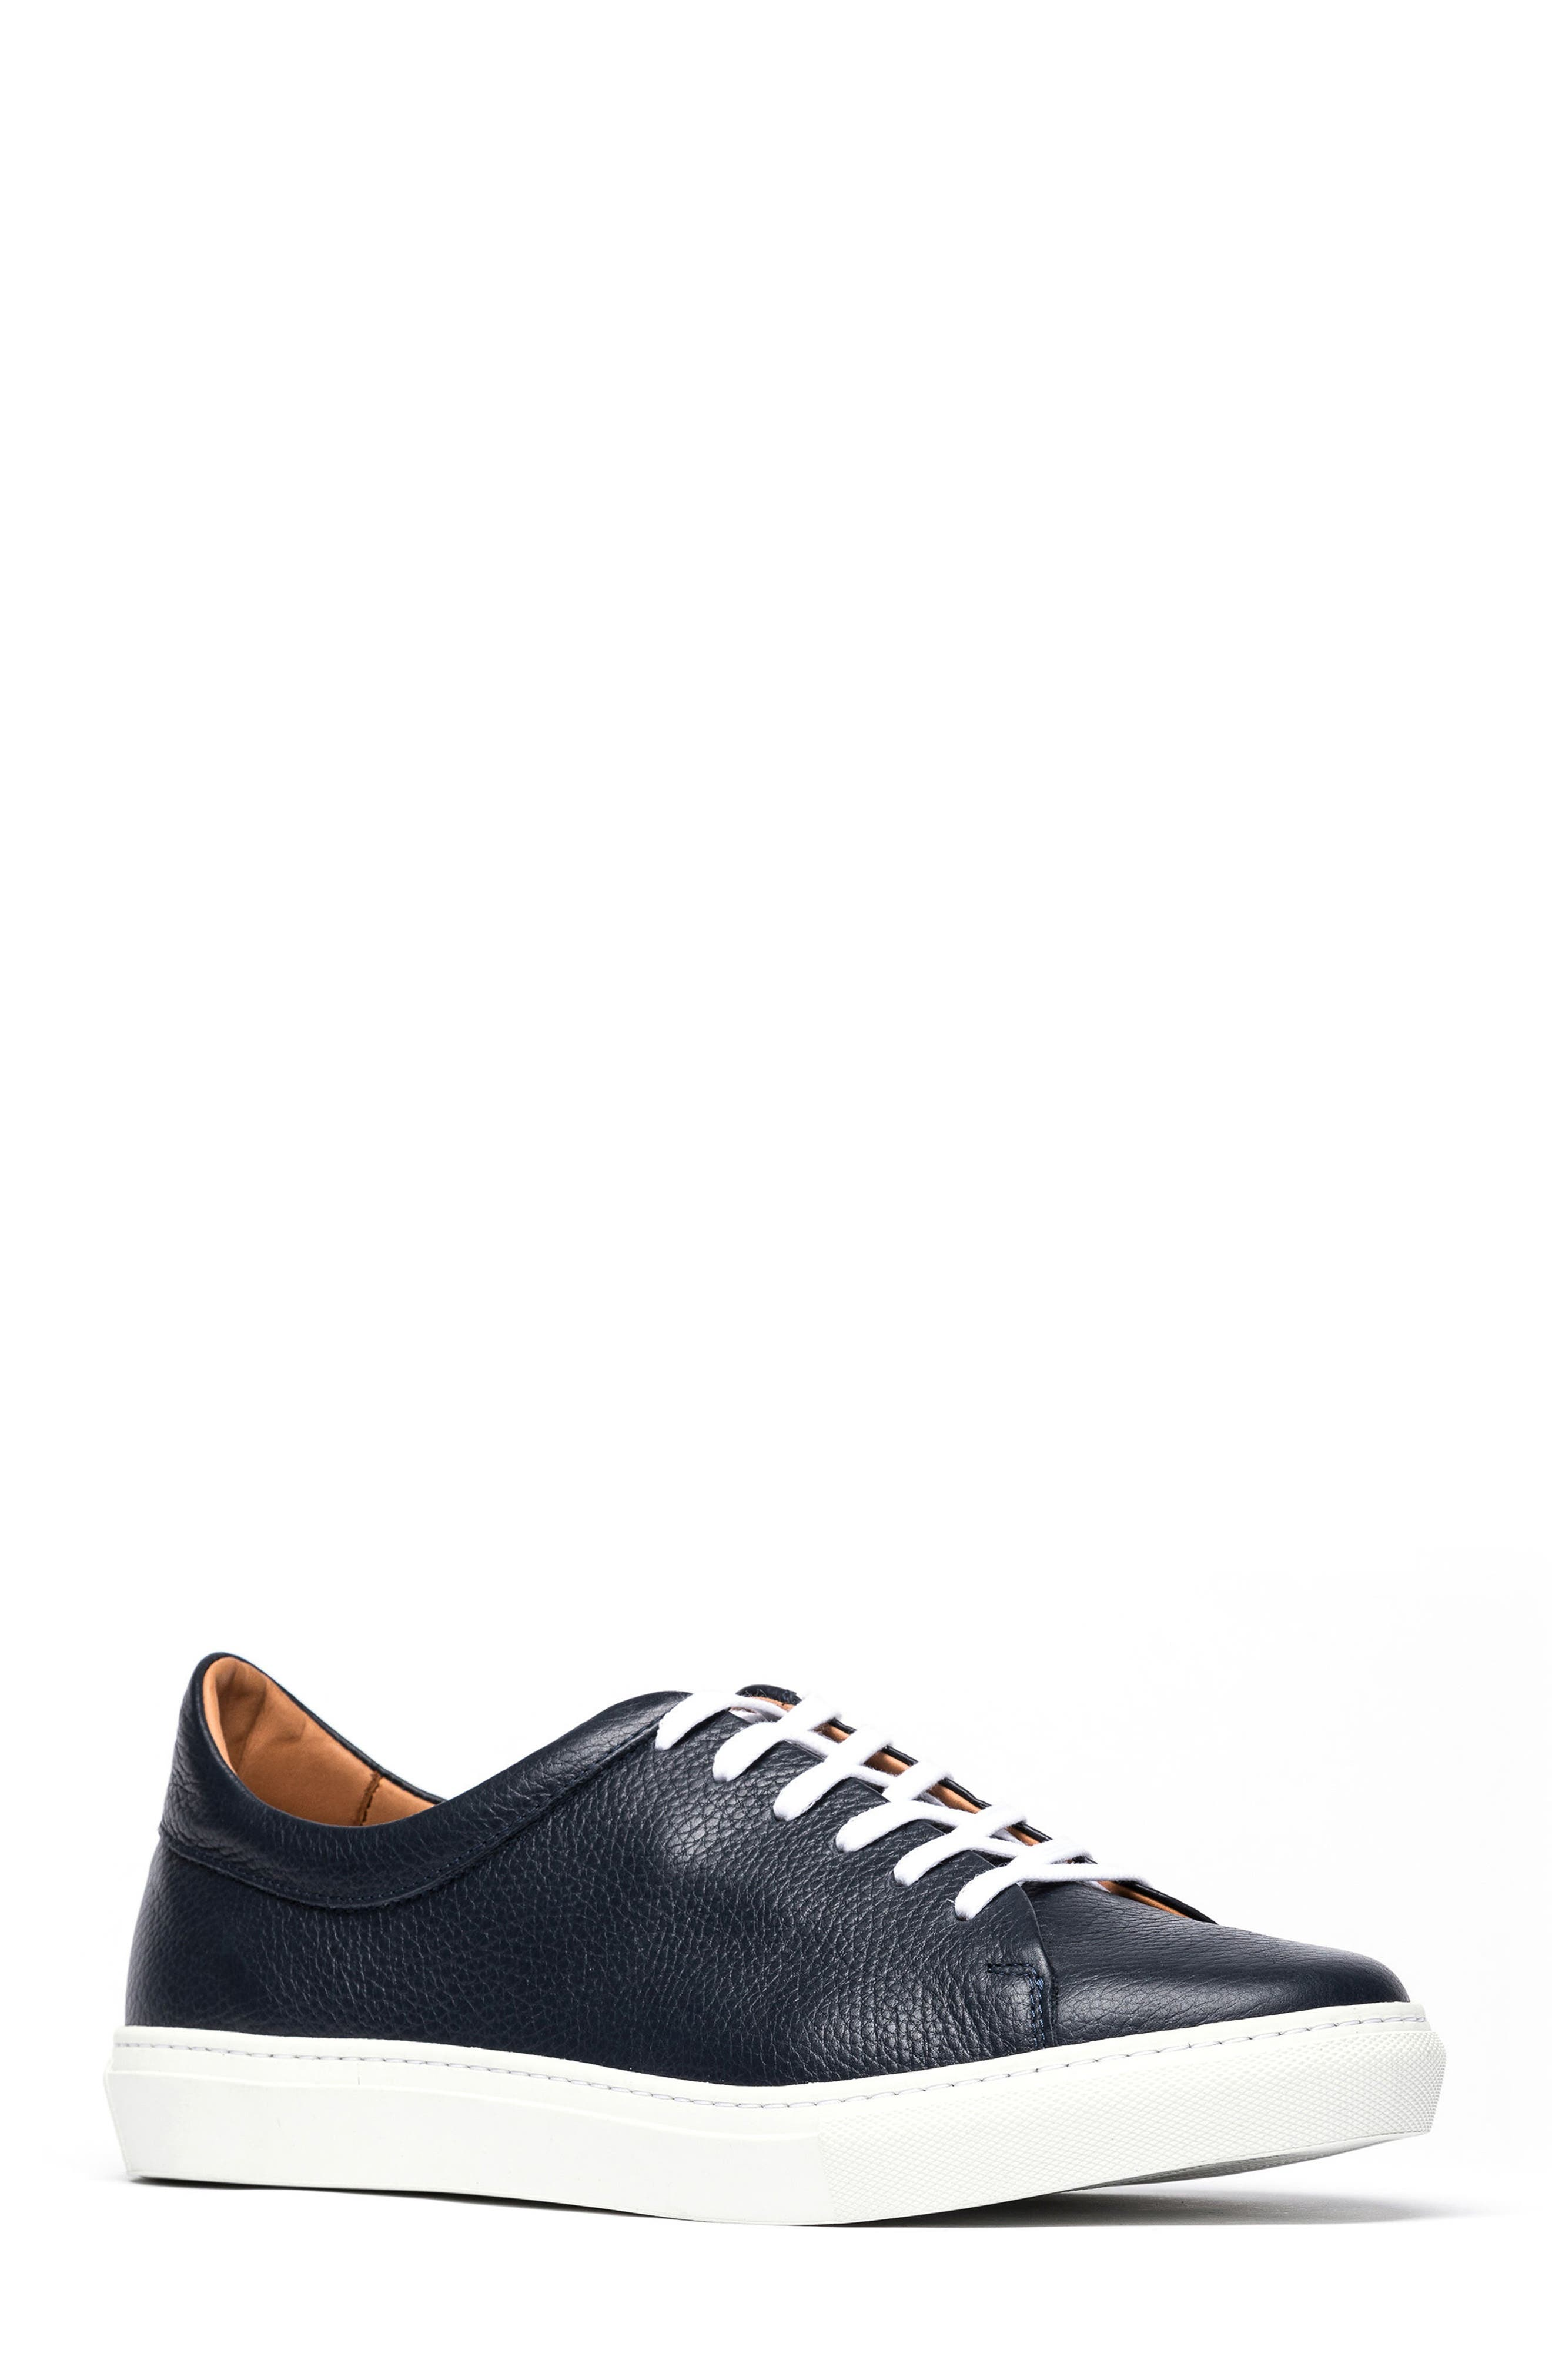 Rodd & Gunn Windemere Sneaker (Men)